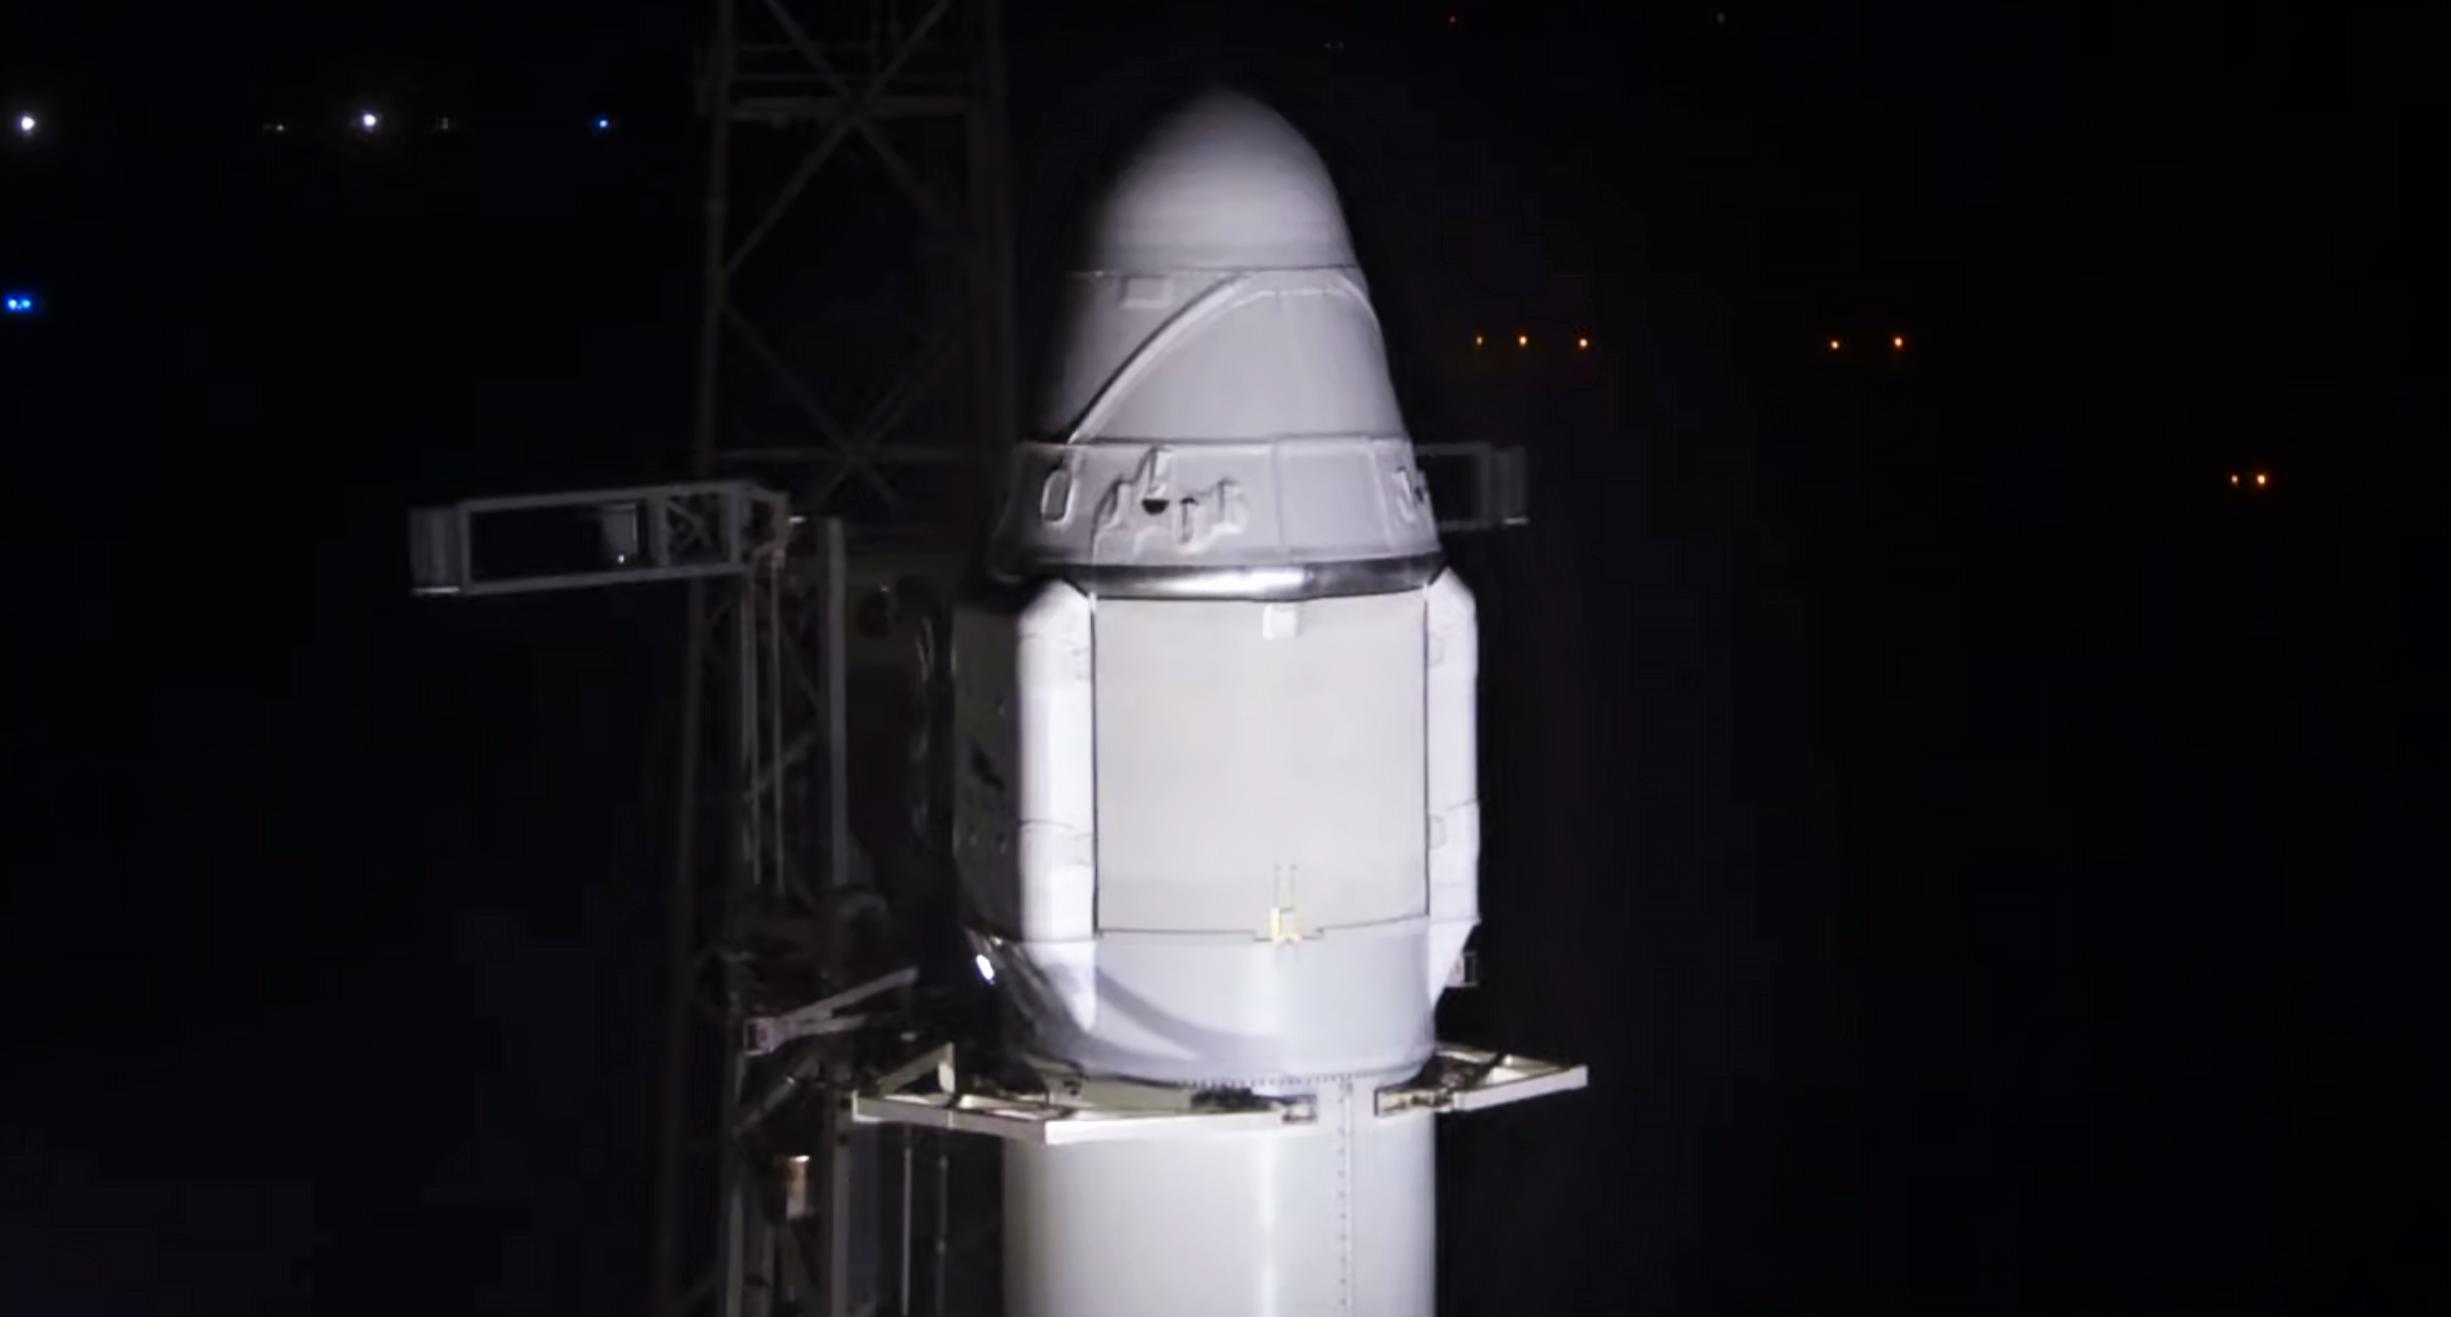 CRS-17 Falcon 9 B1056 scrub (SpaceX) 2